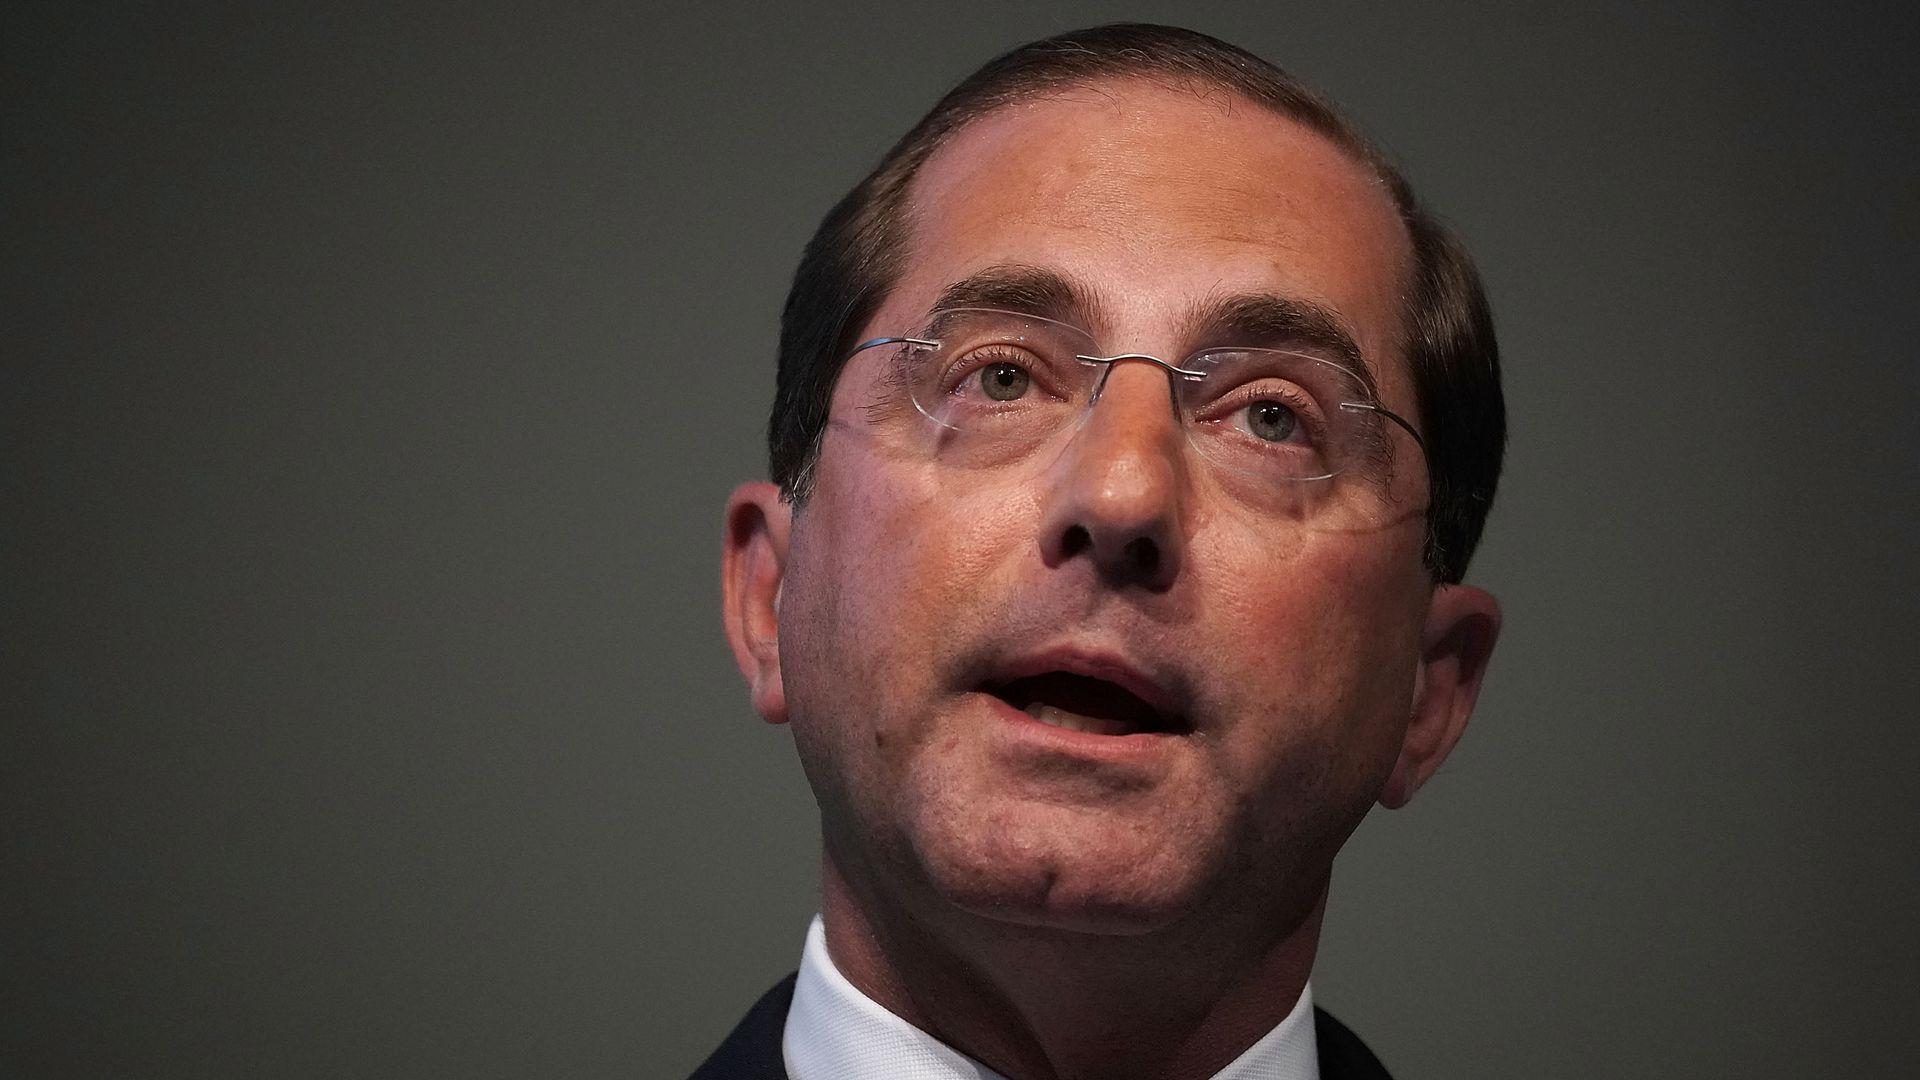 U.S. Secretary of Health and Human Services Alex Azar speaks on prescription drugs